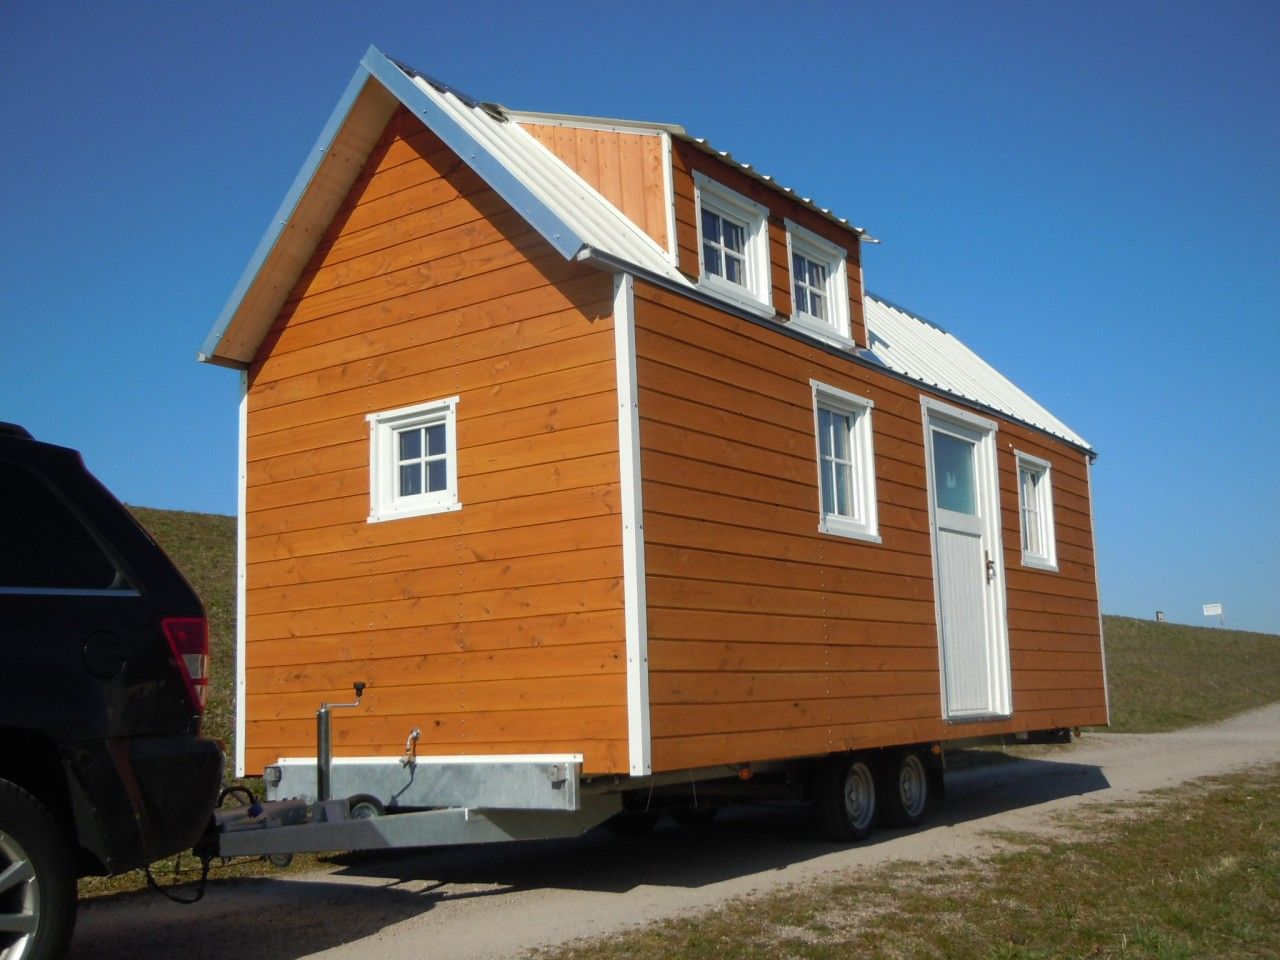 tiny house rheinau kosten tiny houses haus kleines h uschen mobiles haus. Black Bedroom Furniture Sets. Home Design Ideas